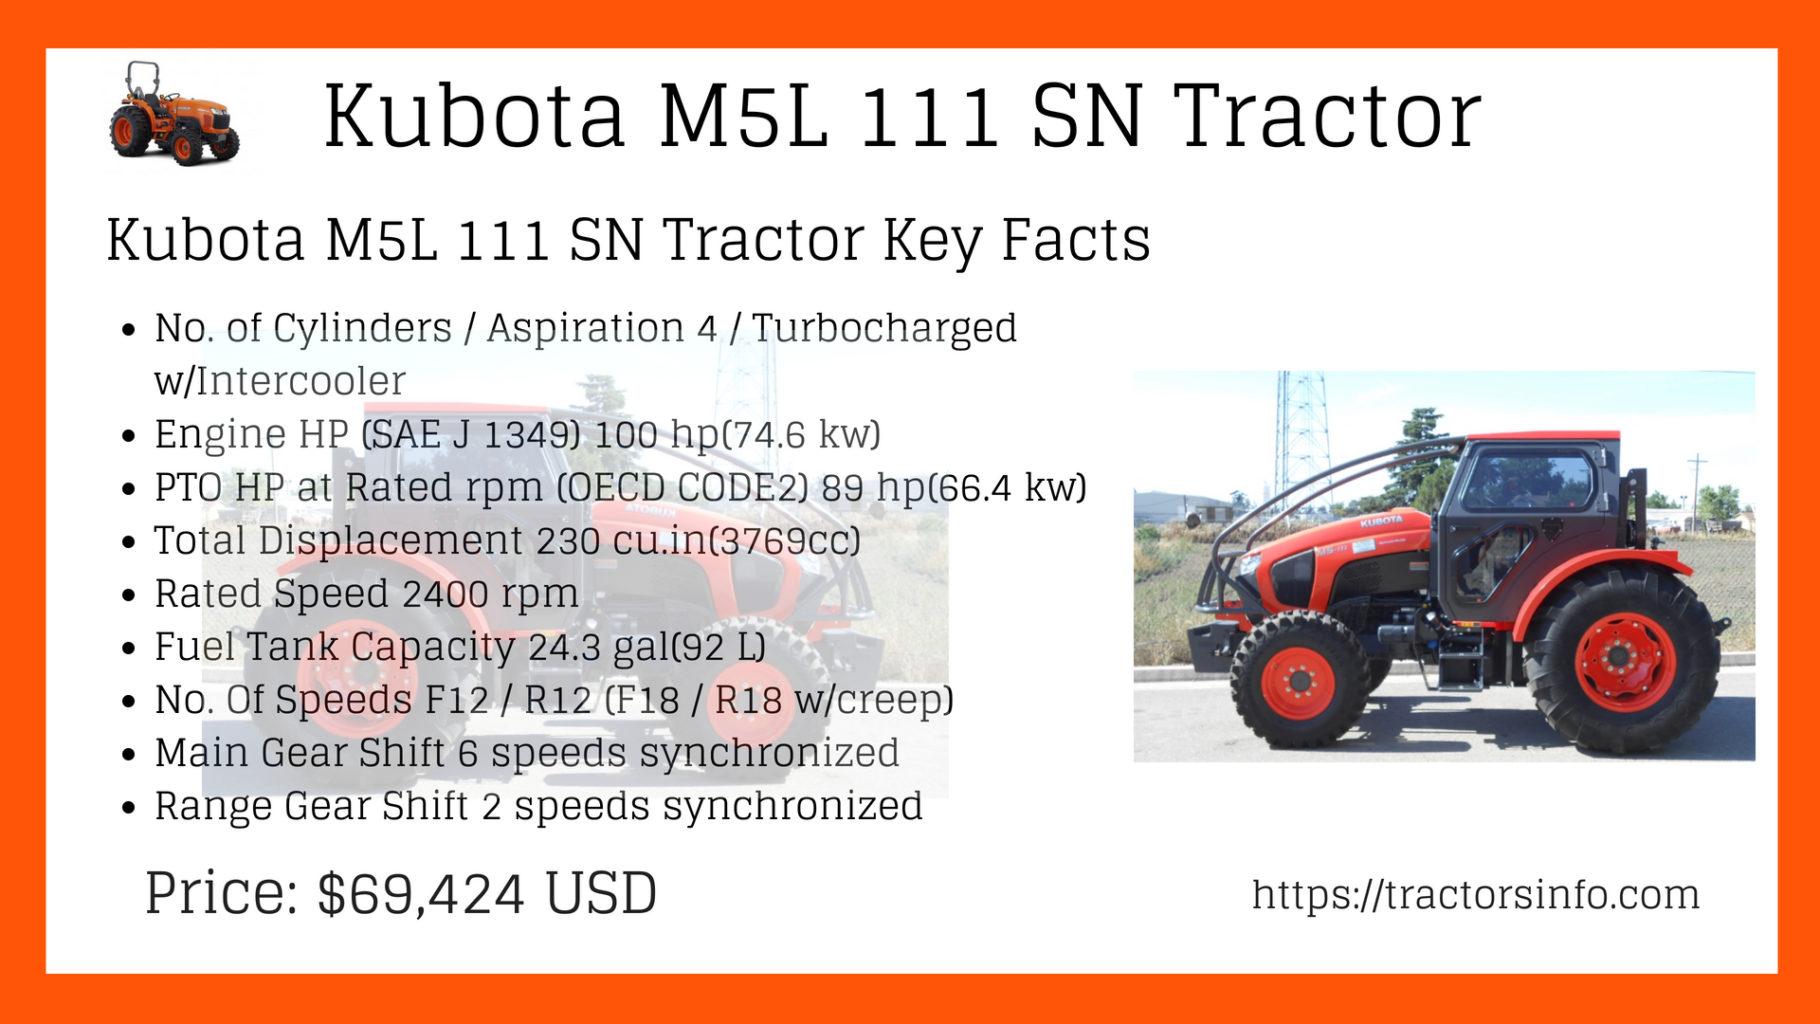 Kubota M5L 111 SN Tractor (2)